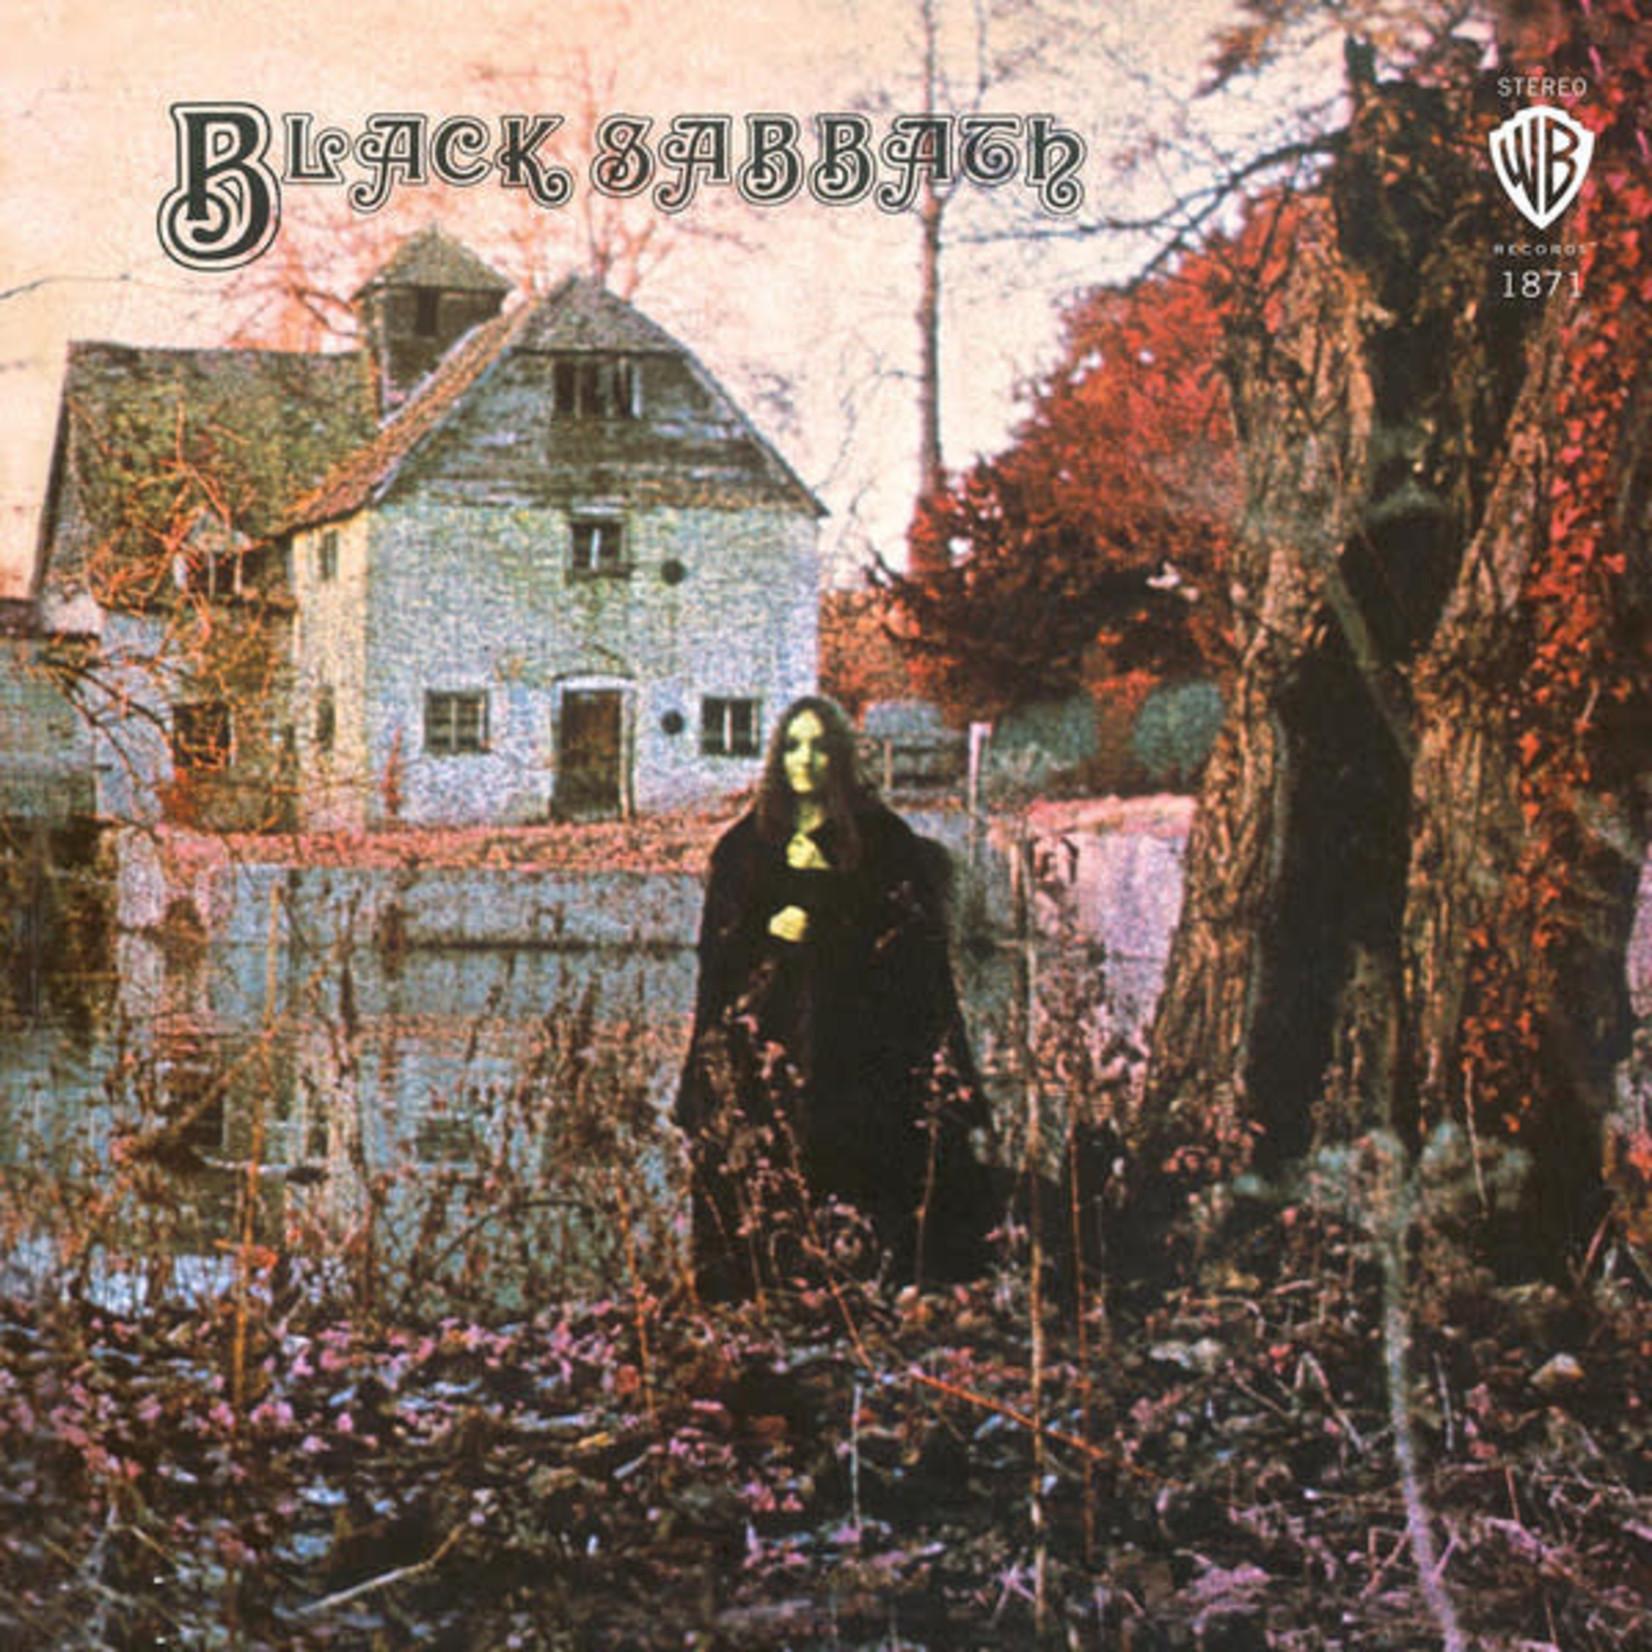 BLACK SABBATH BLACK SABBATH (2012 REMASTERED AUDIO)